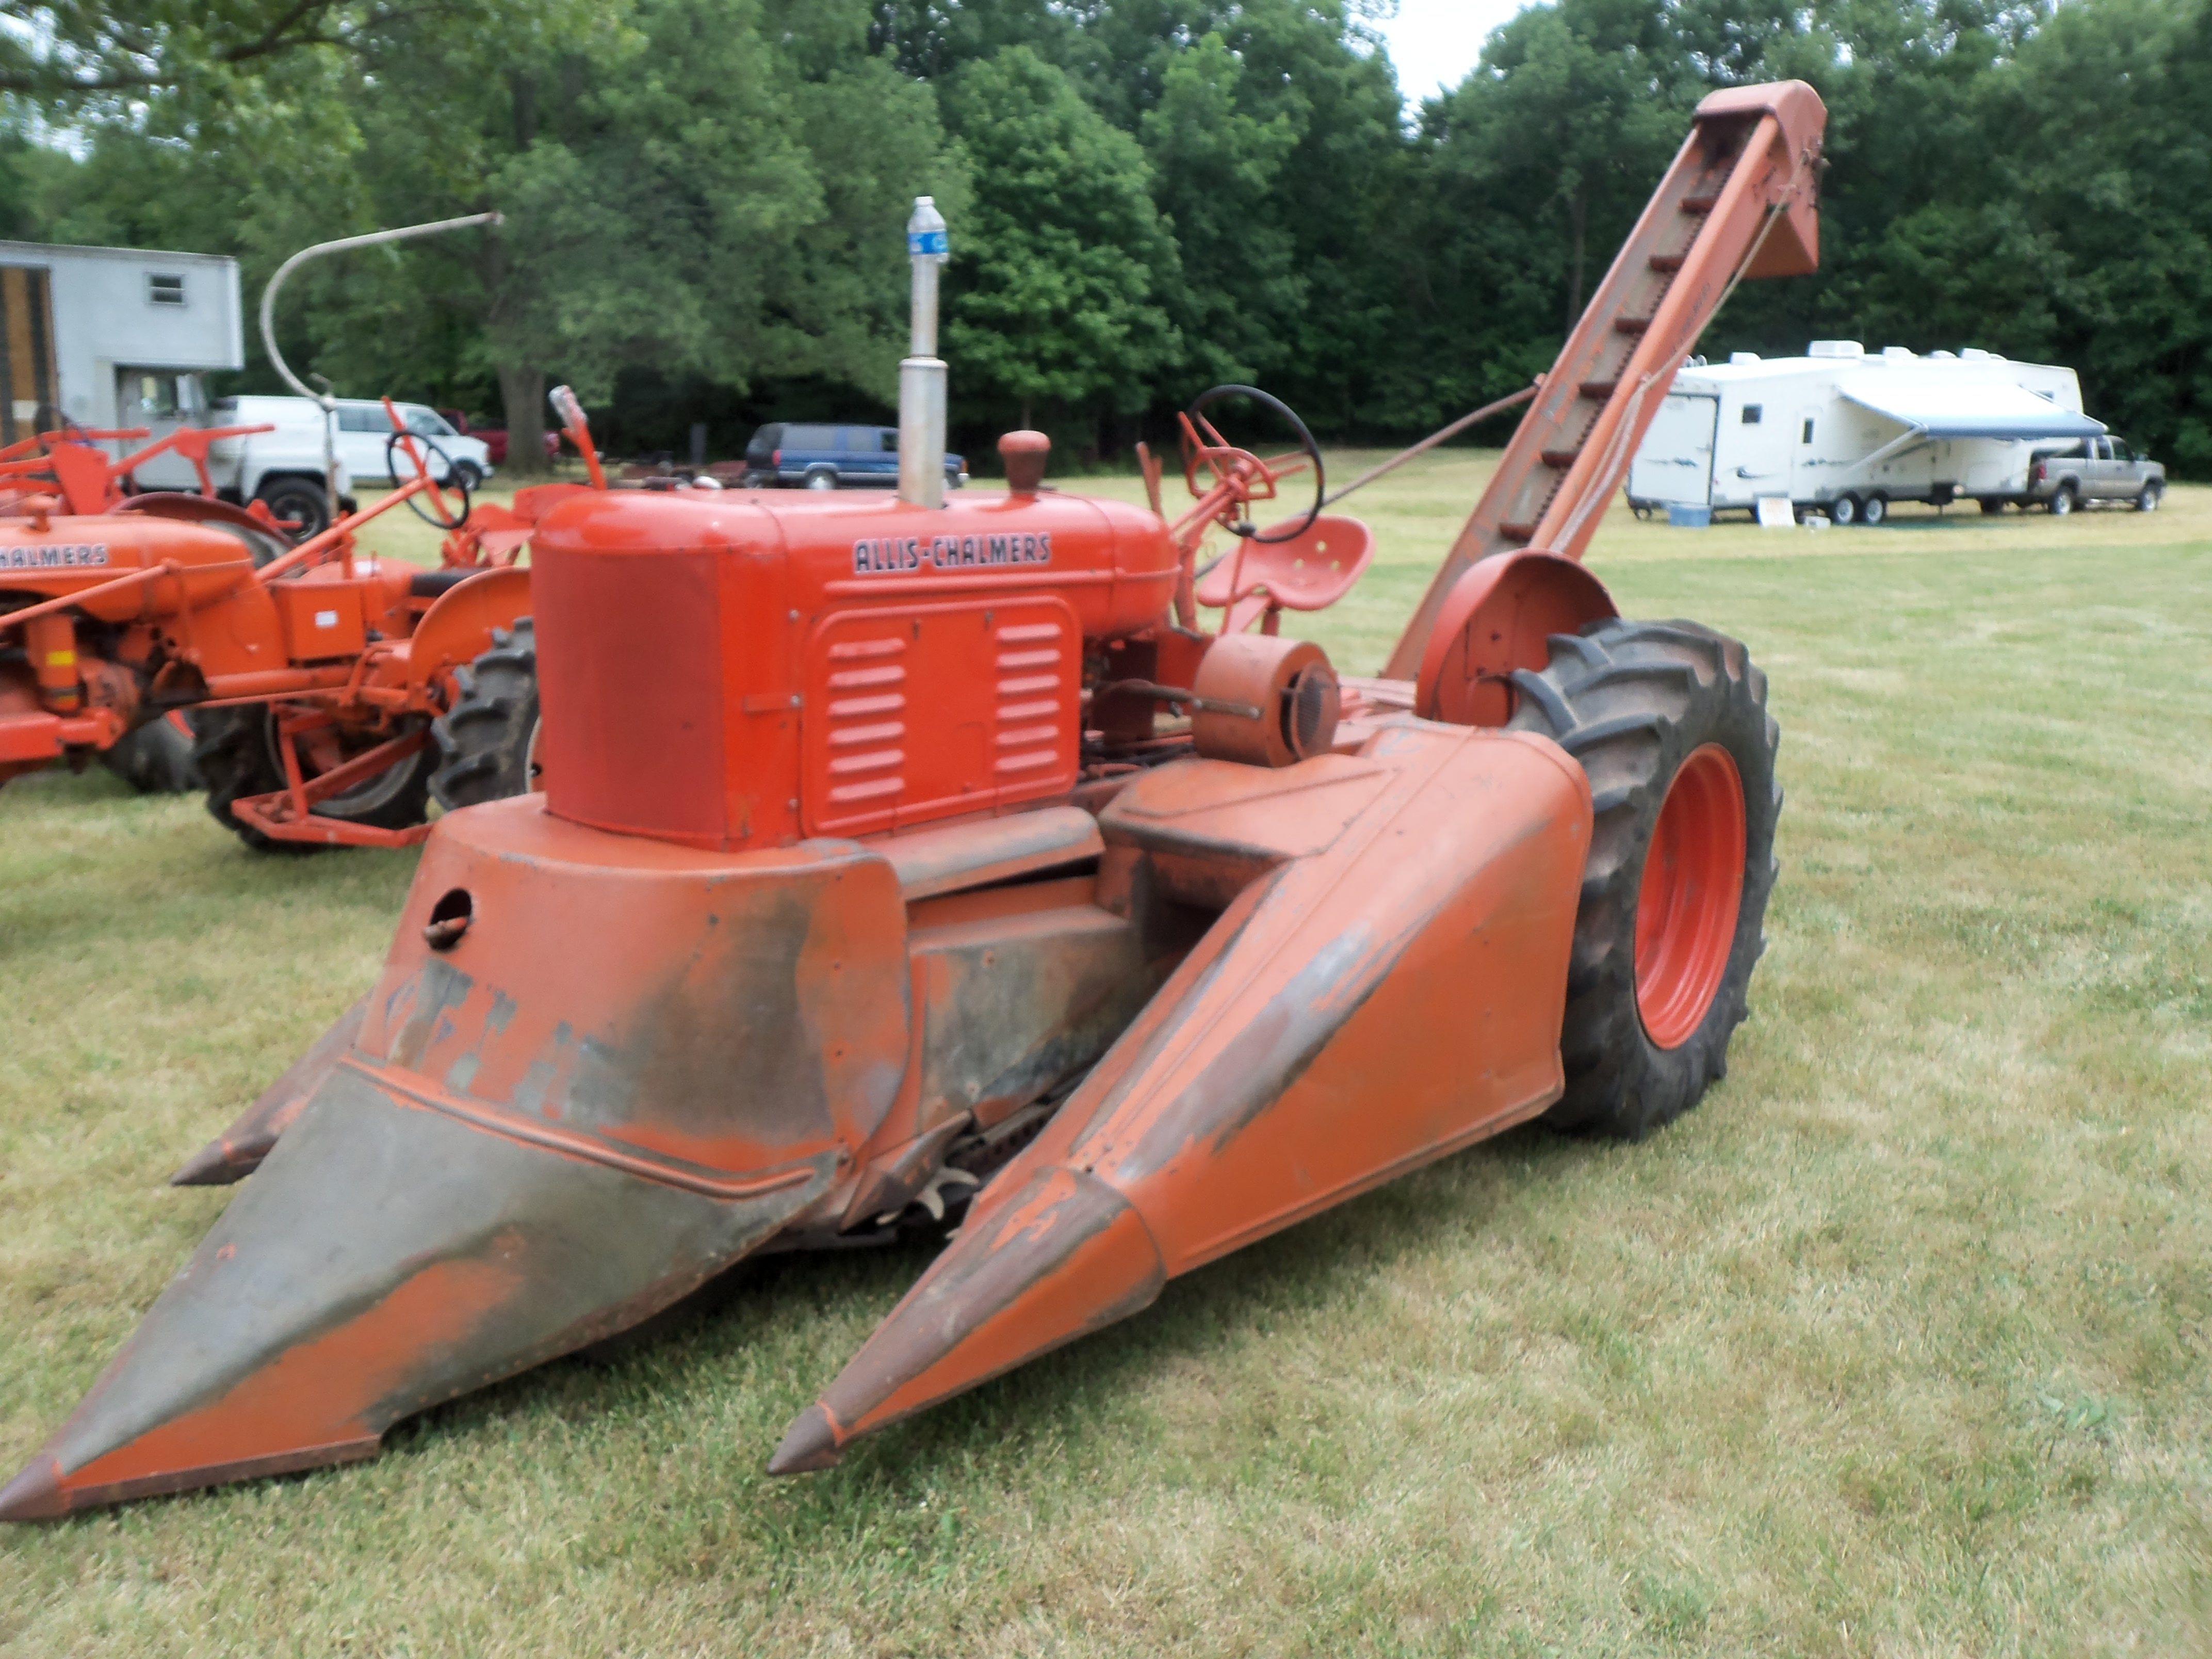 Cartoon Tractor Corn Picker : Tractor with corn picker allis chalmers pinterest